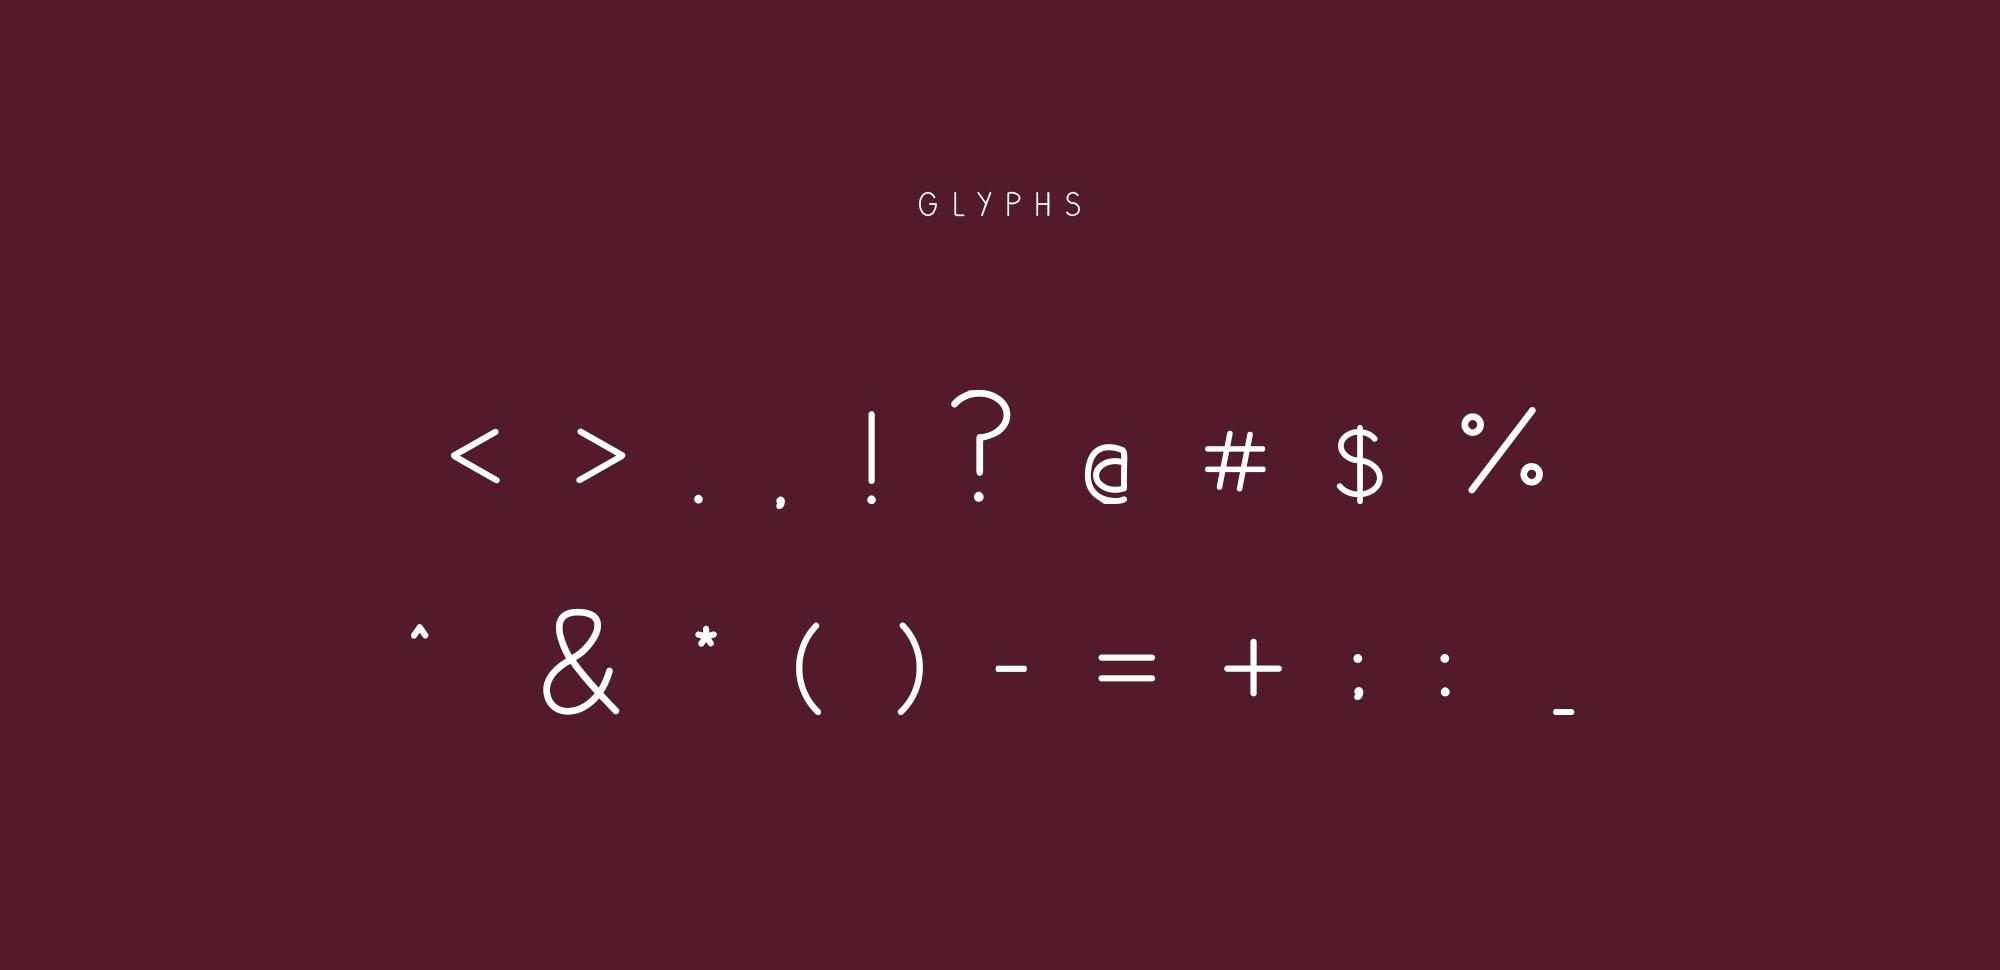 Plum Typeface Glyphs